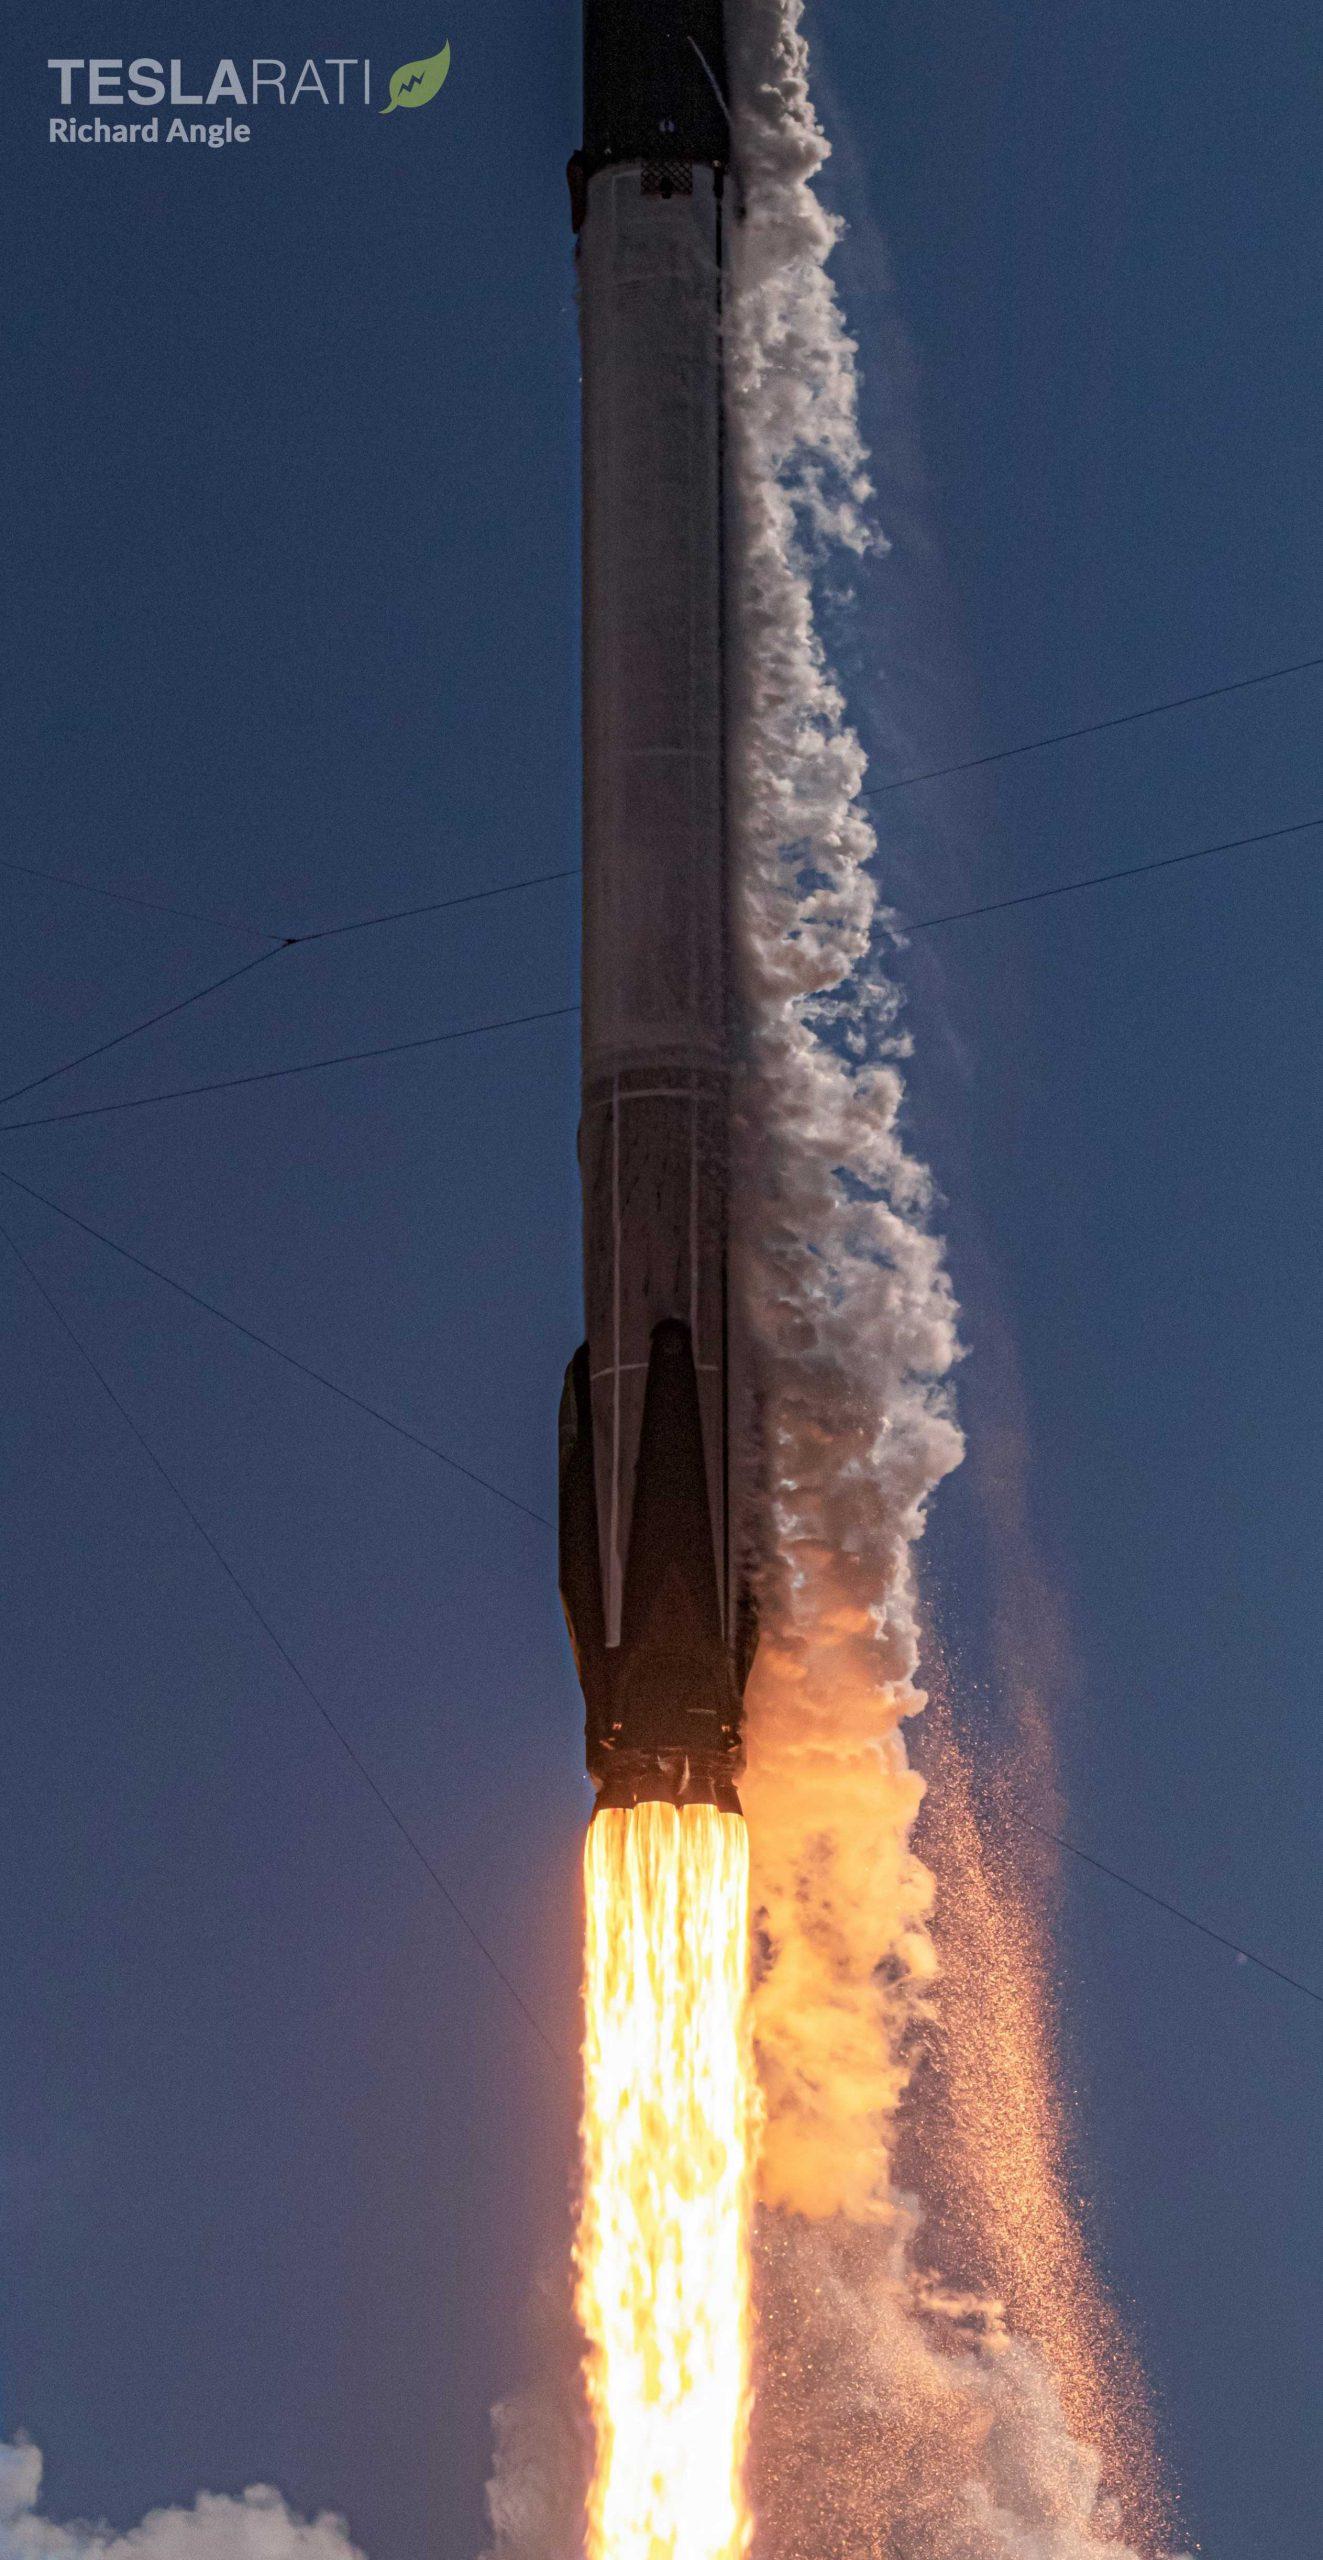 ANASIS II Falcon 9 B1058 072020 (Richard Angle) launch 7 crop 2 (c)